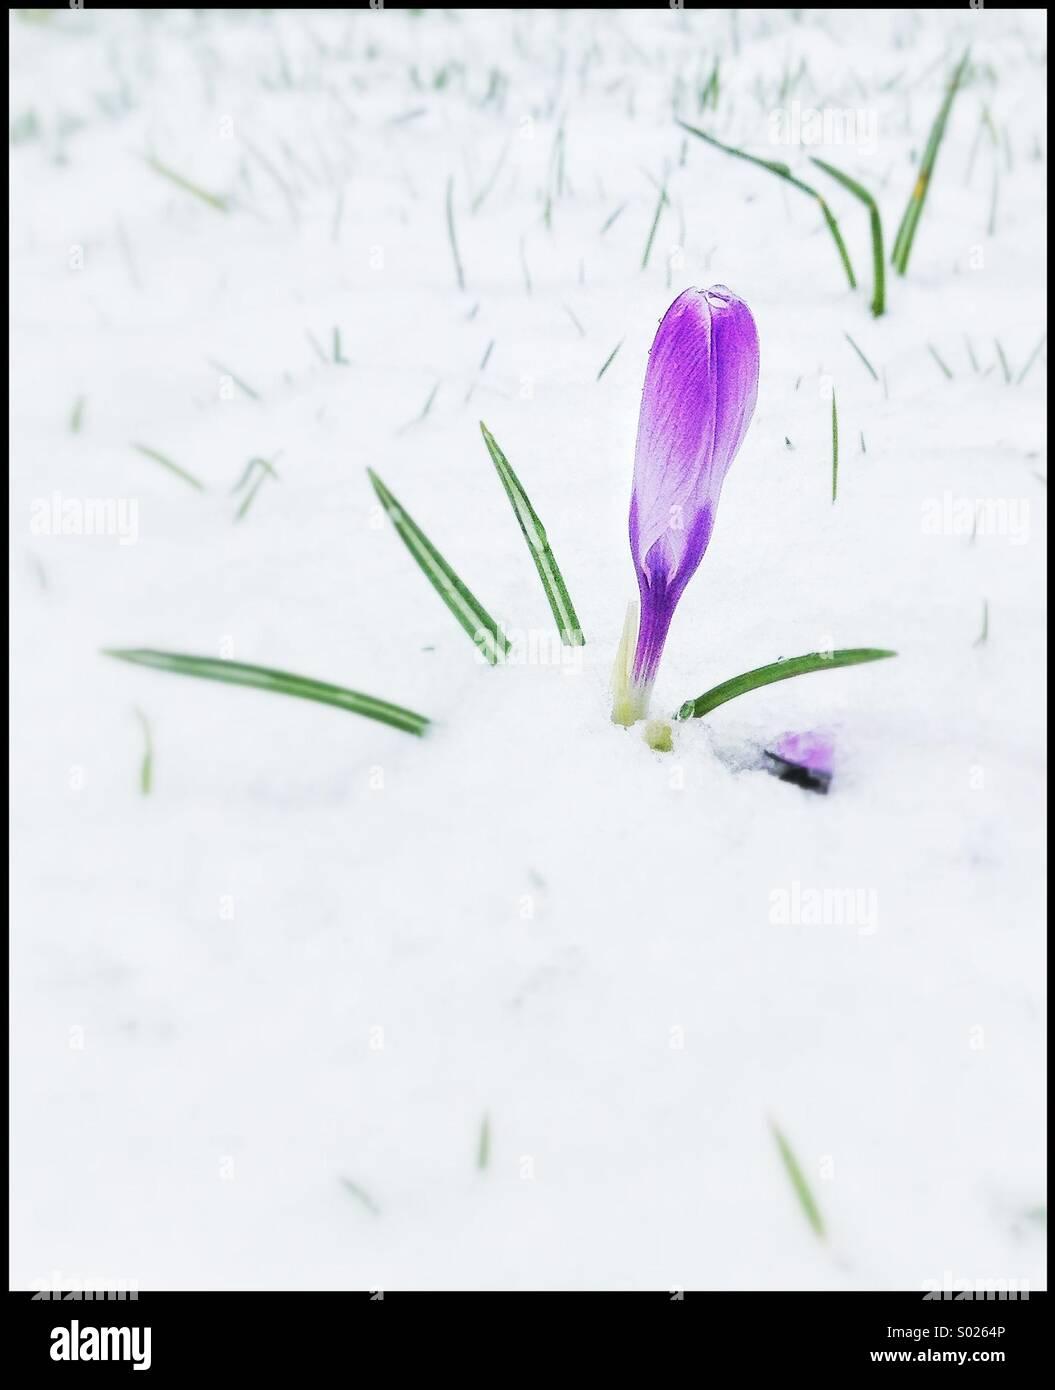 Crocus flower in snow - Stock Image